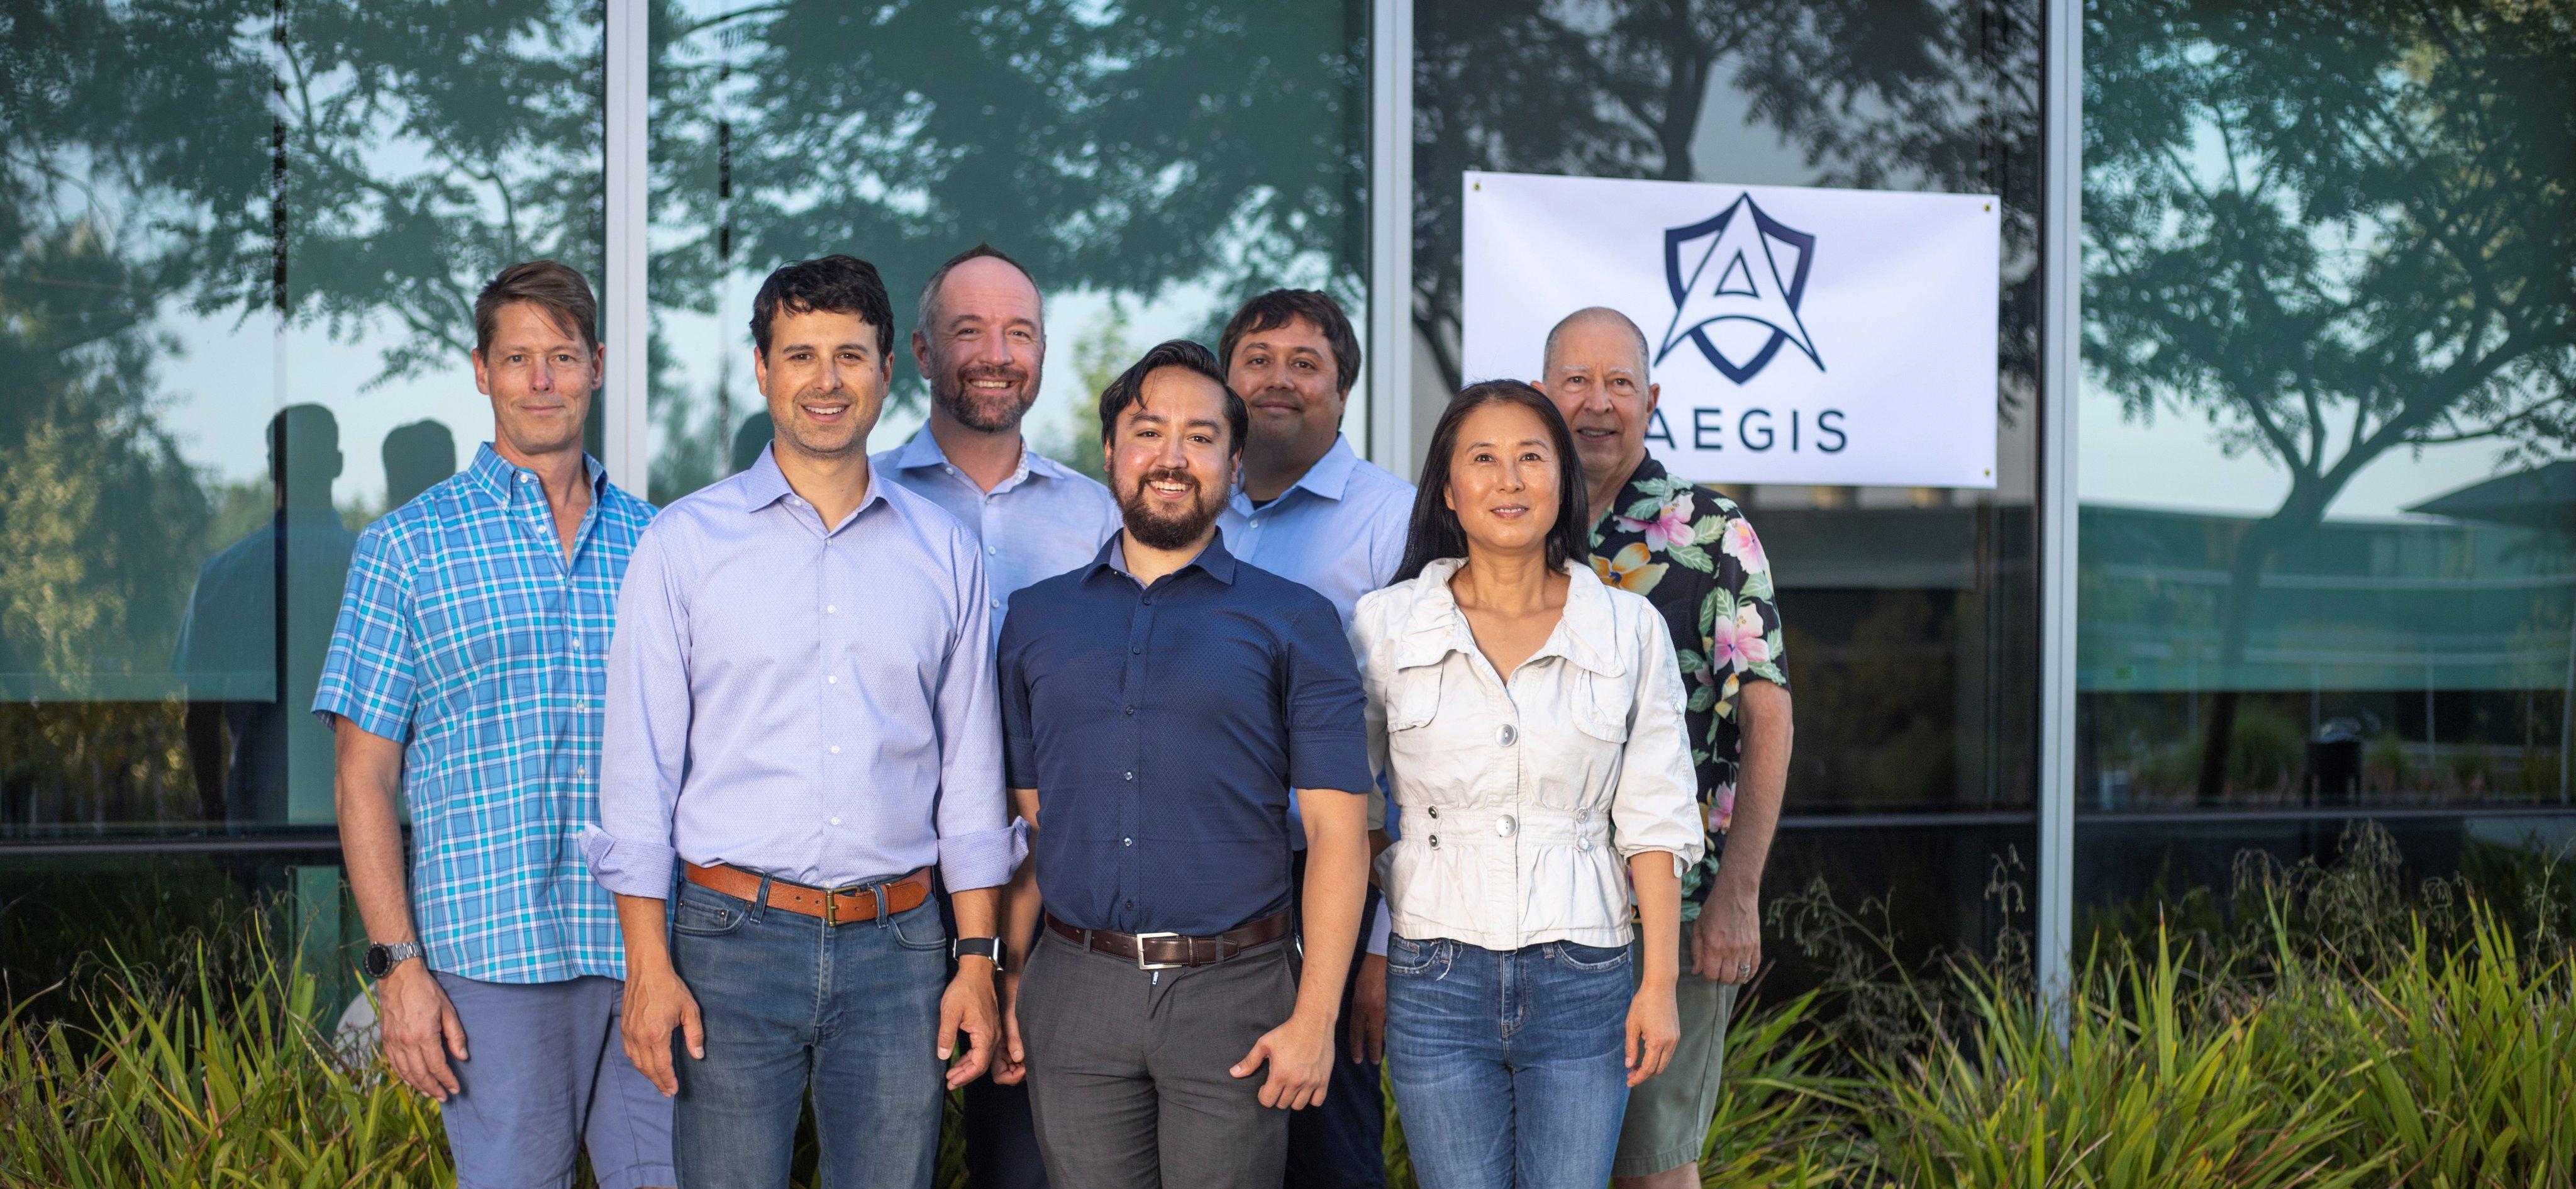 Aegis Life, Inc